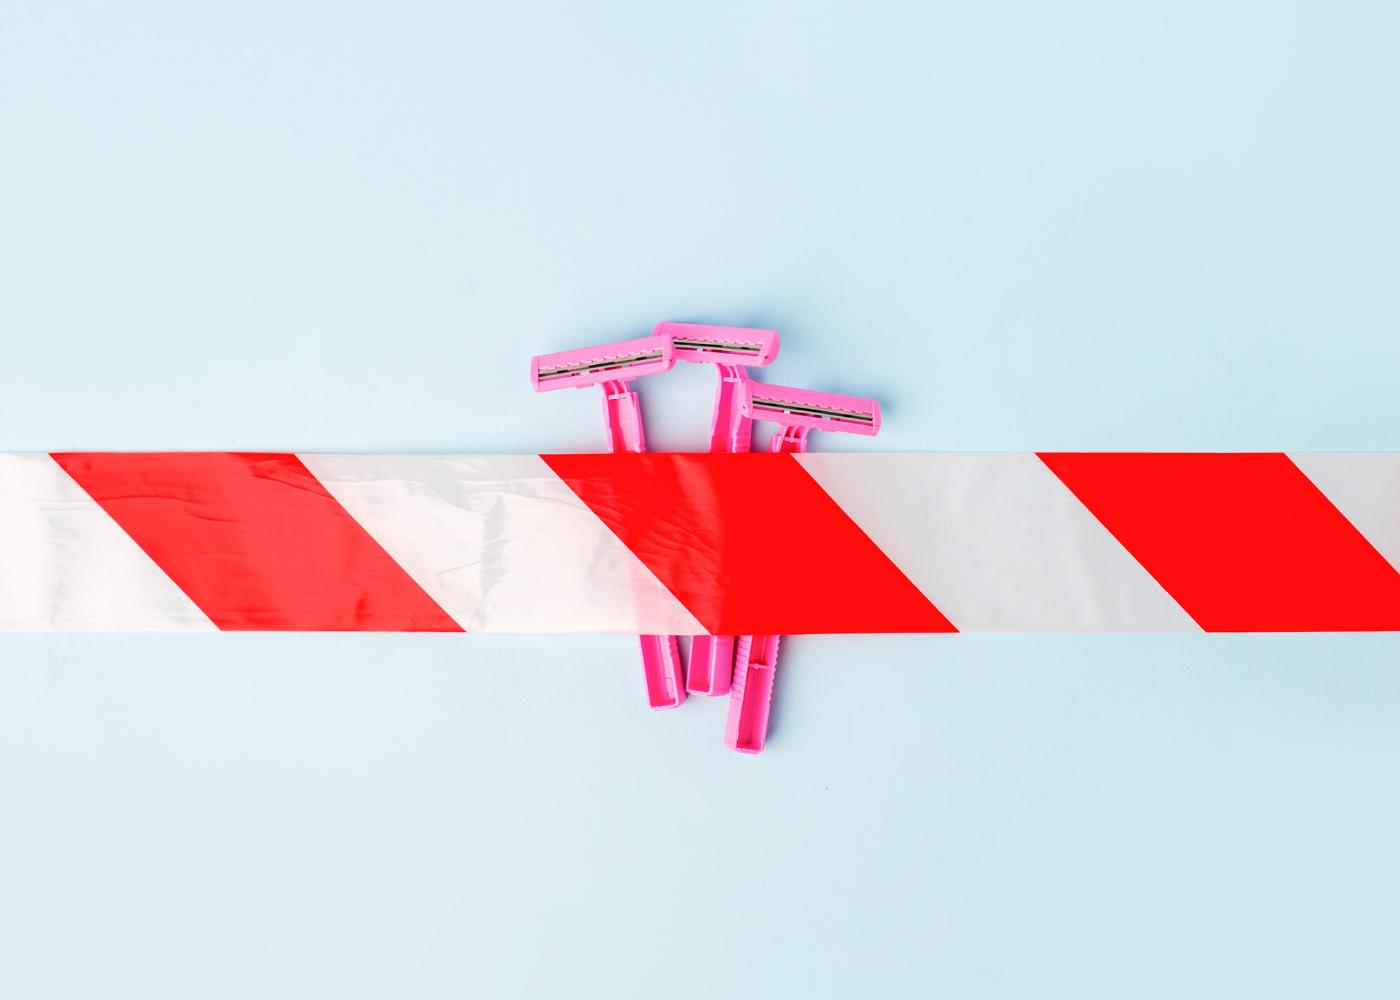 hair-removal-singapore-waxing-ipl-say-no-to-razors